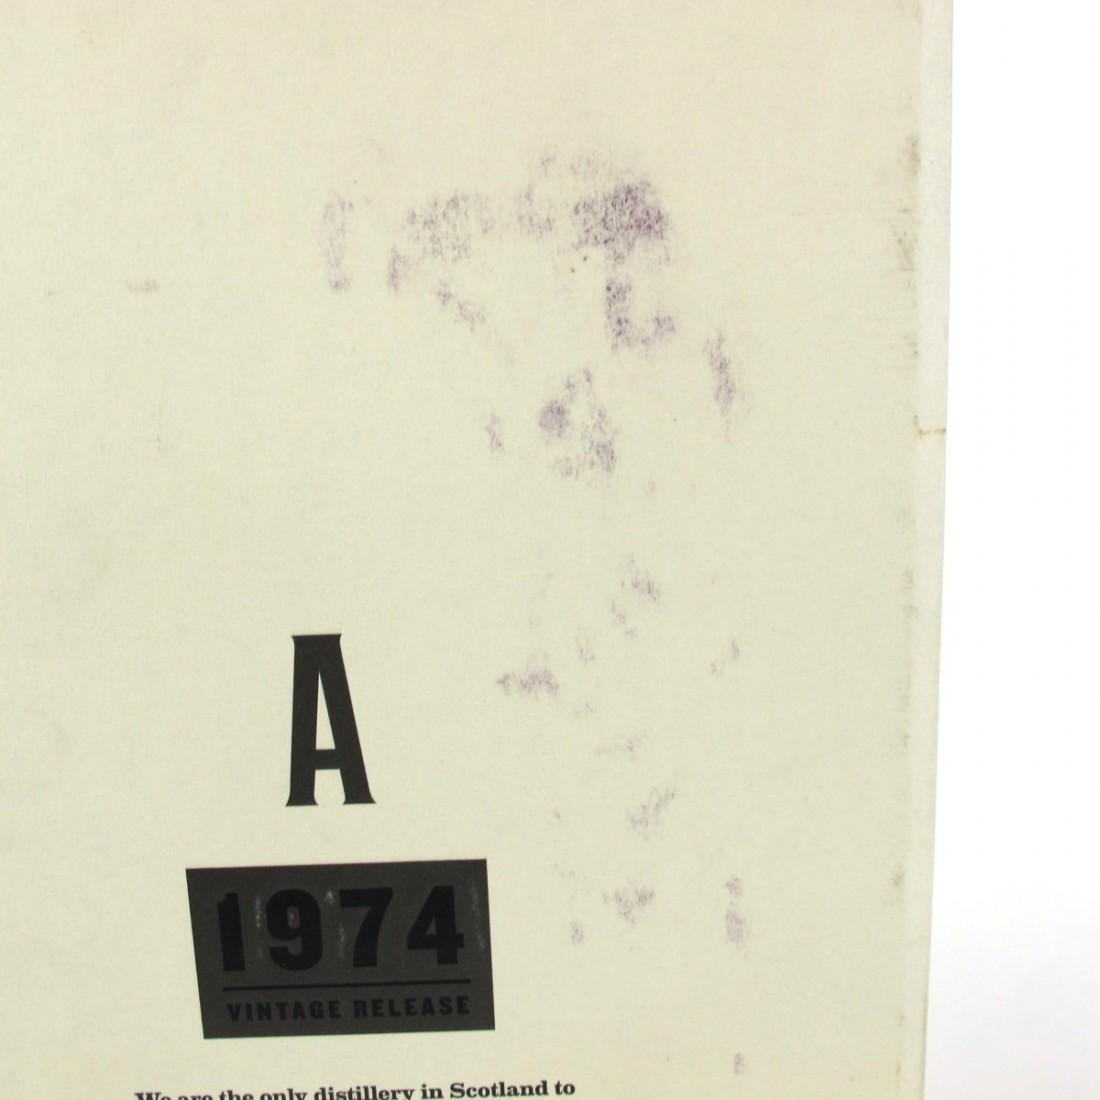 Auchentoshan 1974 Single Cask 37 Year Old